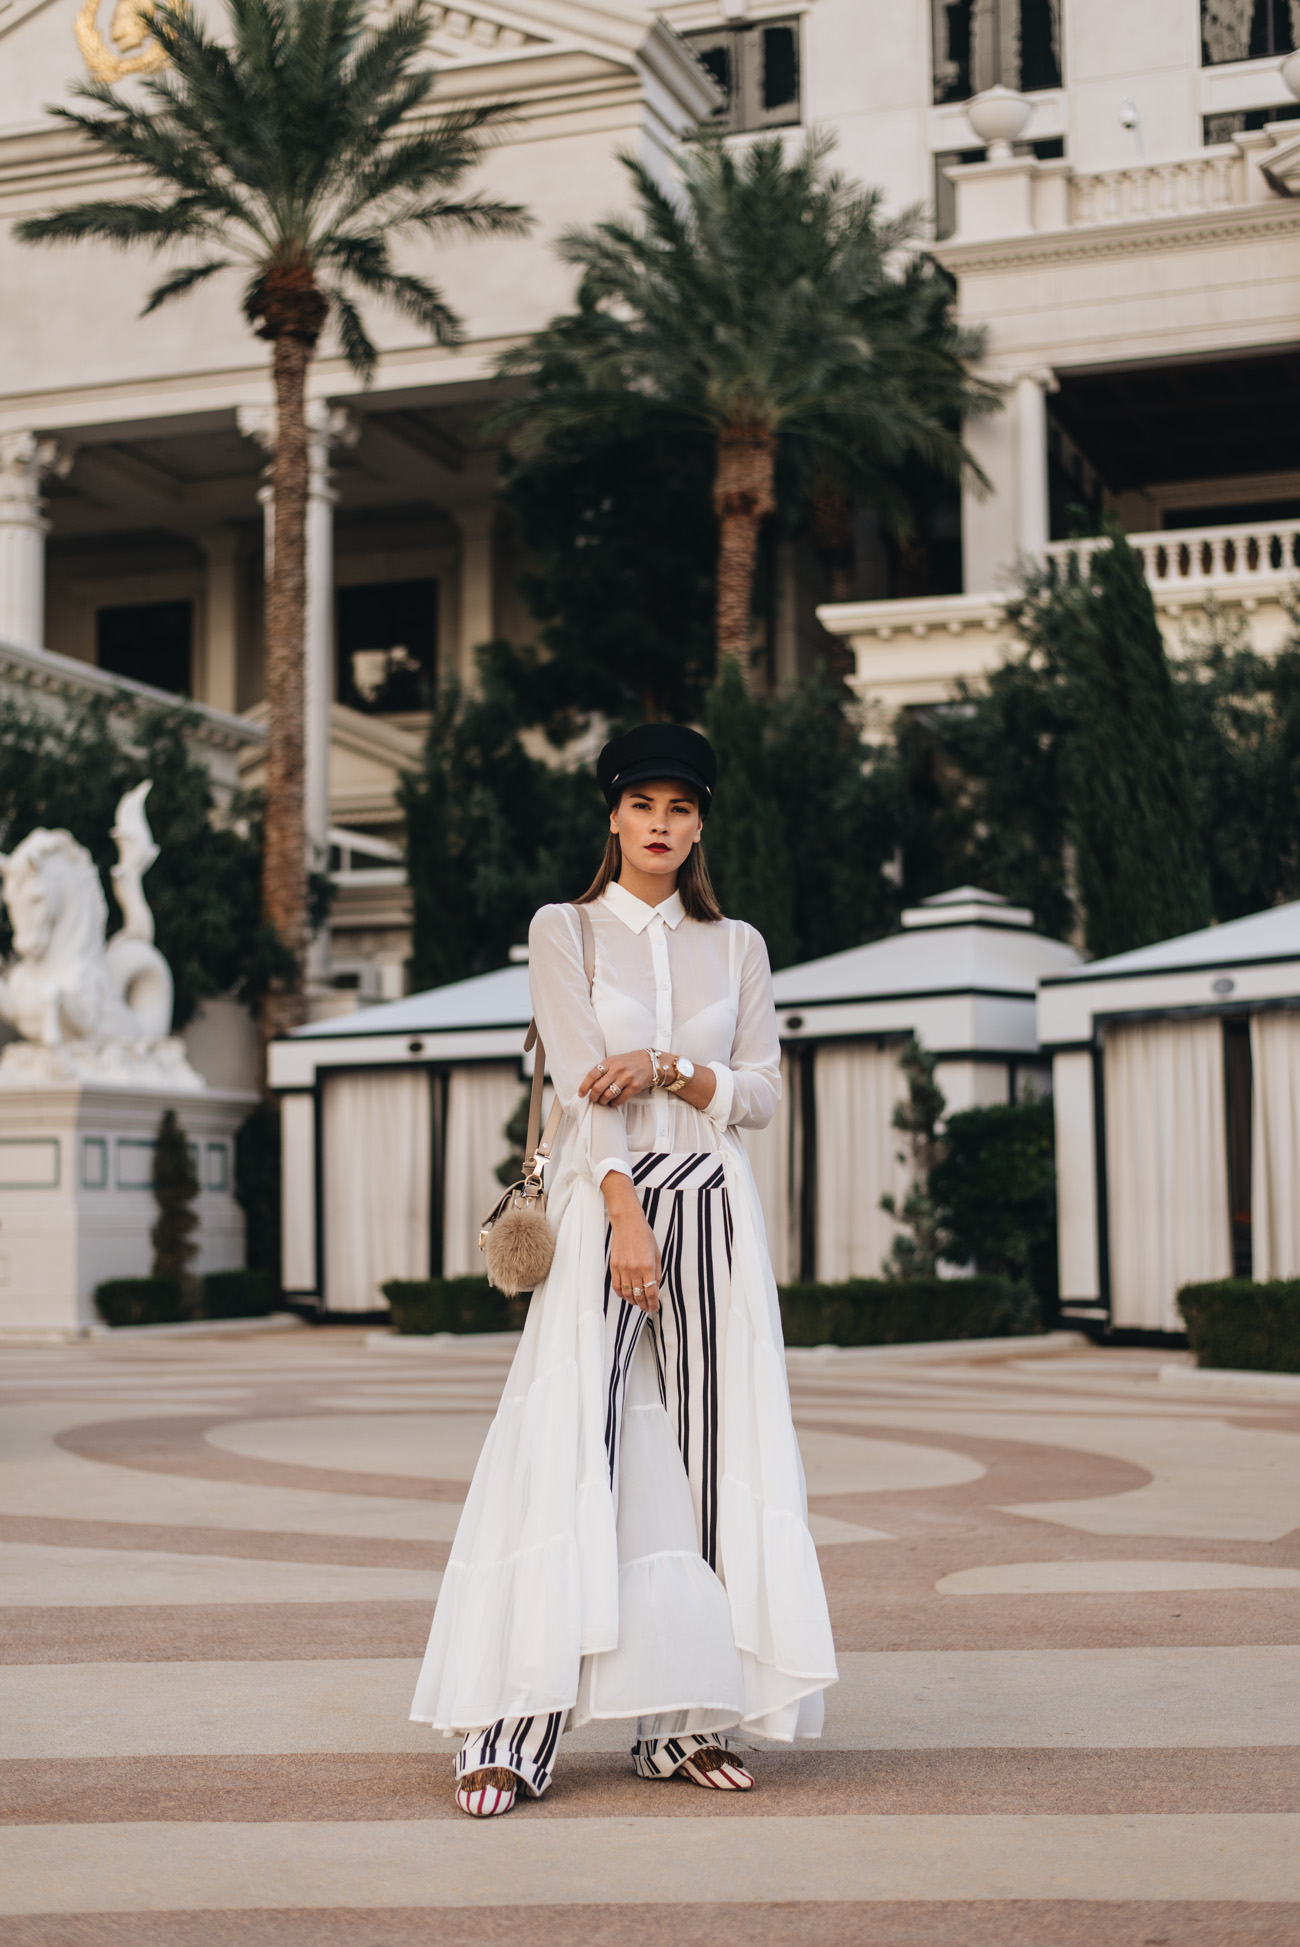 Fashion-Editorial-Foto-Shooting-las-vegas-caesar-palace-hotel-nina-schwichtenberg-mode-bloggerin-fashionbloggerin-fashiioncarpet